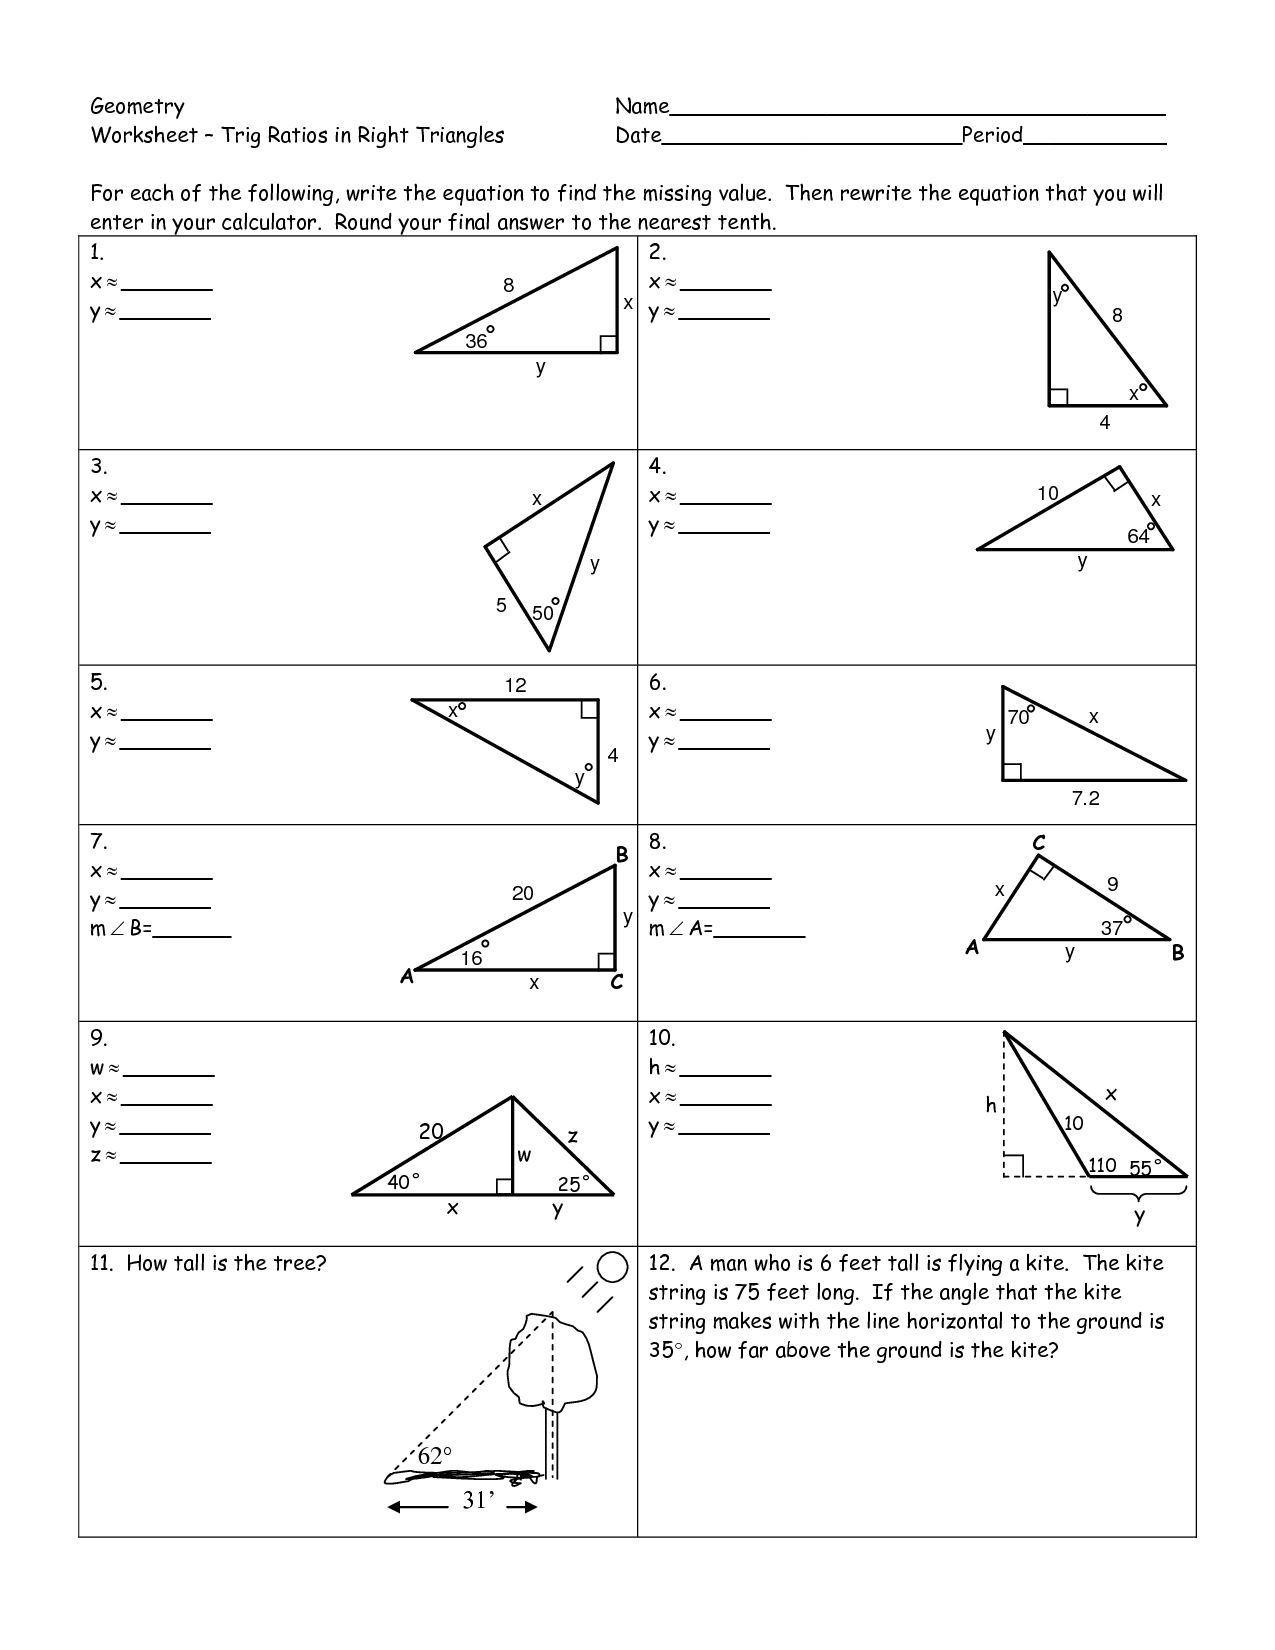 Right Triangle Trig Worksheet Trigonometry Worksheets Pdf A Trigonometry Worksheets Pdf